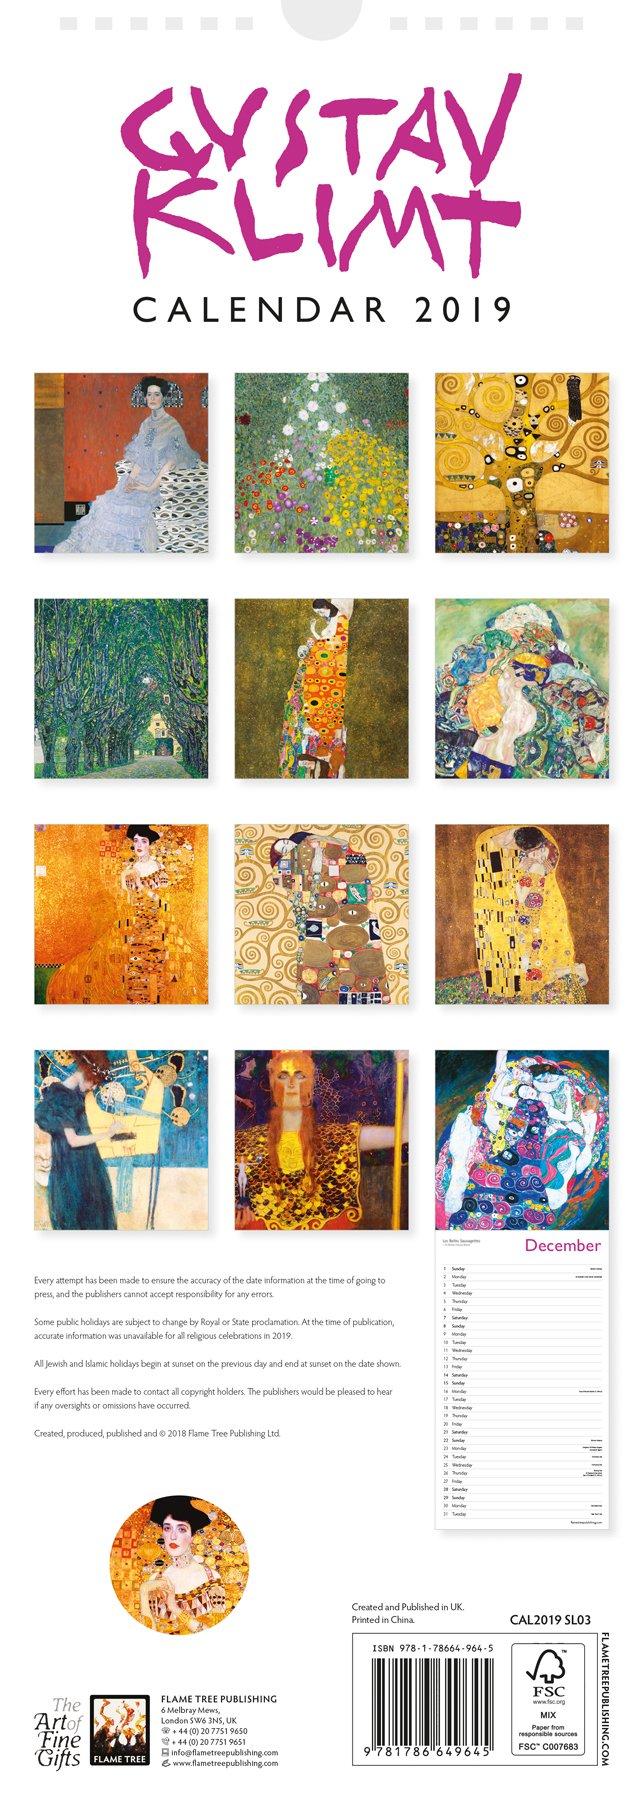 88b5fd0dcd2 Gustav Klimt slim calendar 2019 (Art Calendar)  Amazon.co.uk  Flame Tree  Studio  9781786649645  Books